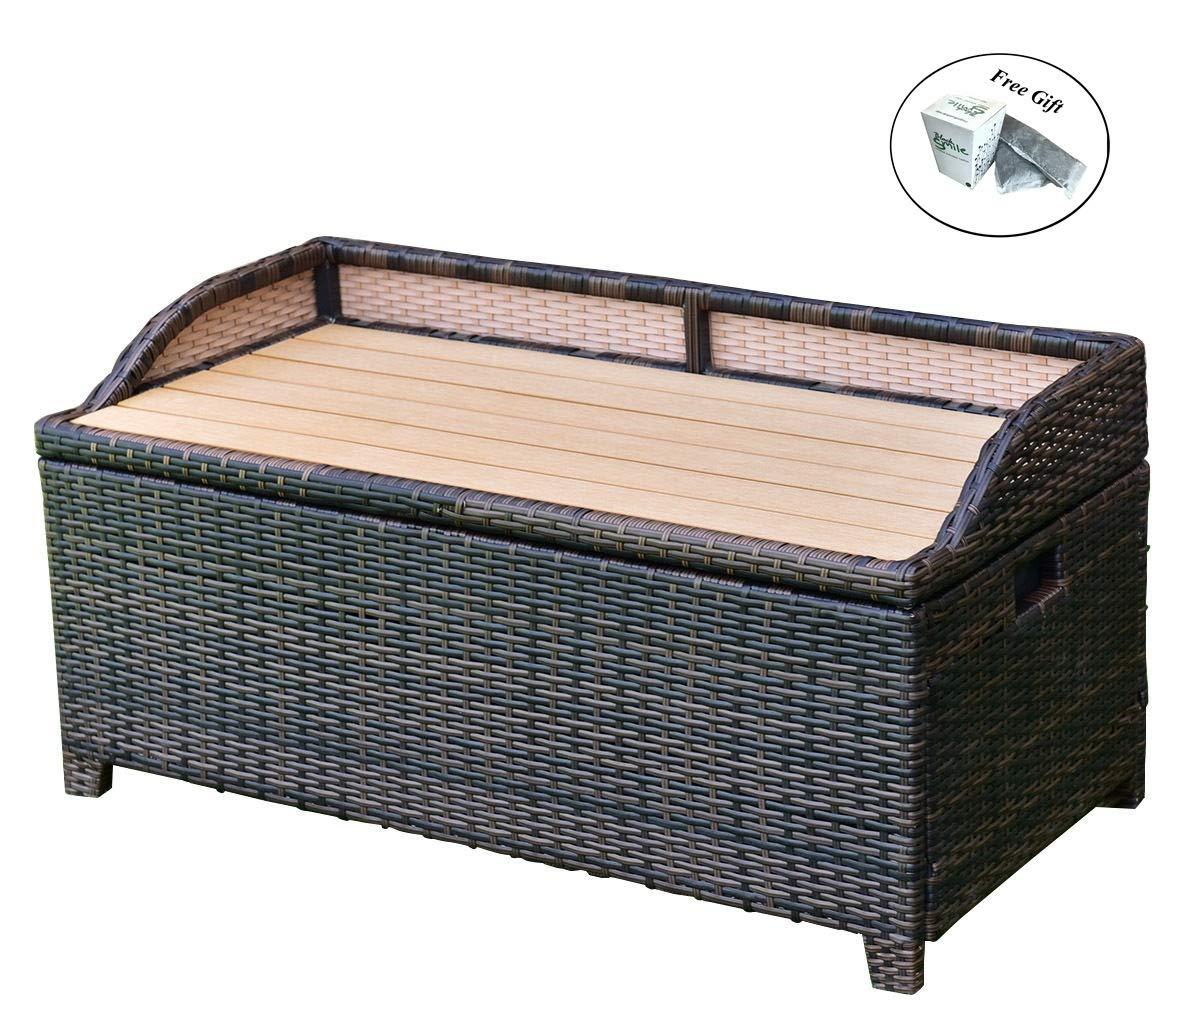 Eight24hours 50 Gallon Patio Rattan Storage Bench Container Box Wicker Chest Organizer Seat + FREE E-Book